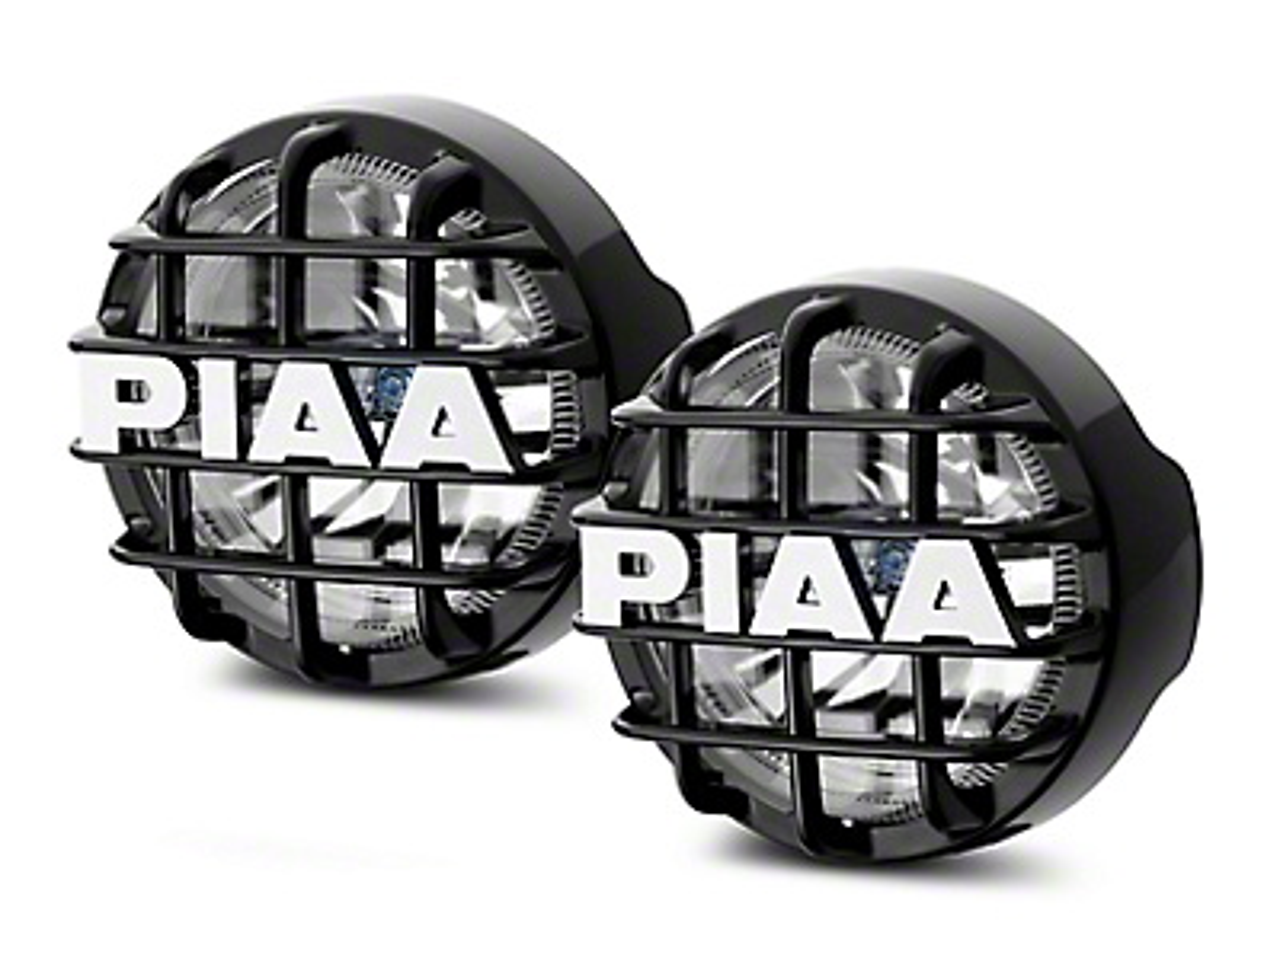 PIAA 510 Series 4 in. Round Xtreme White SMR Lights - Driving Beam - Pair